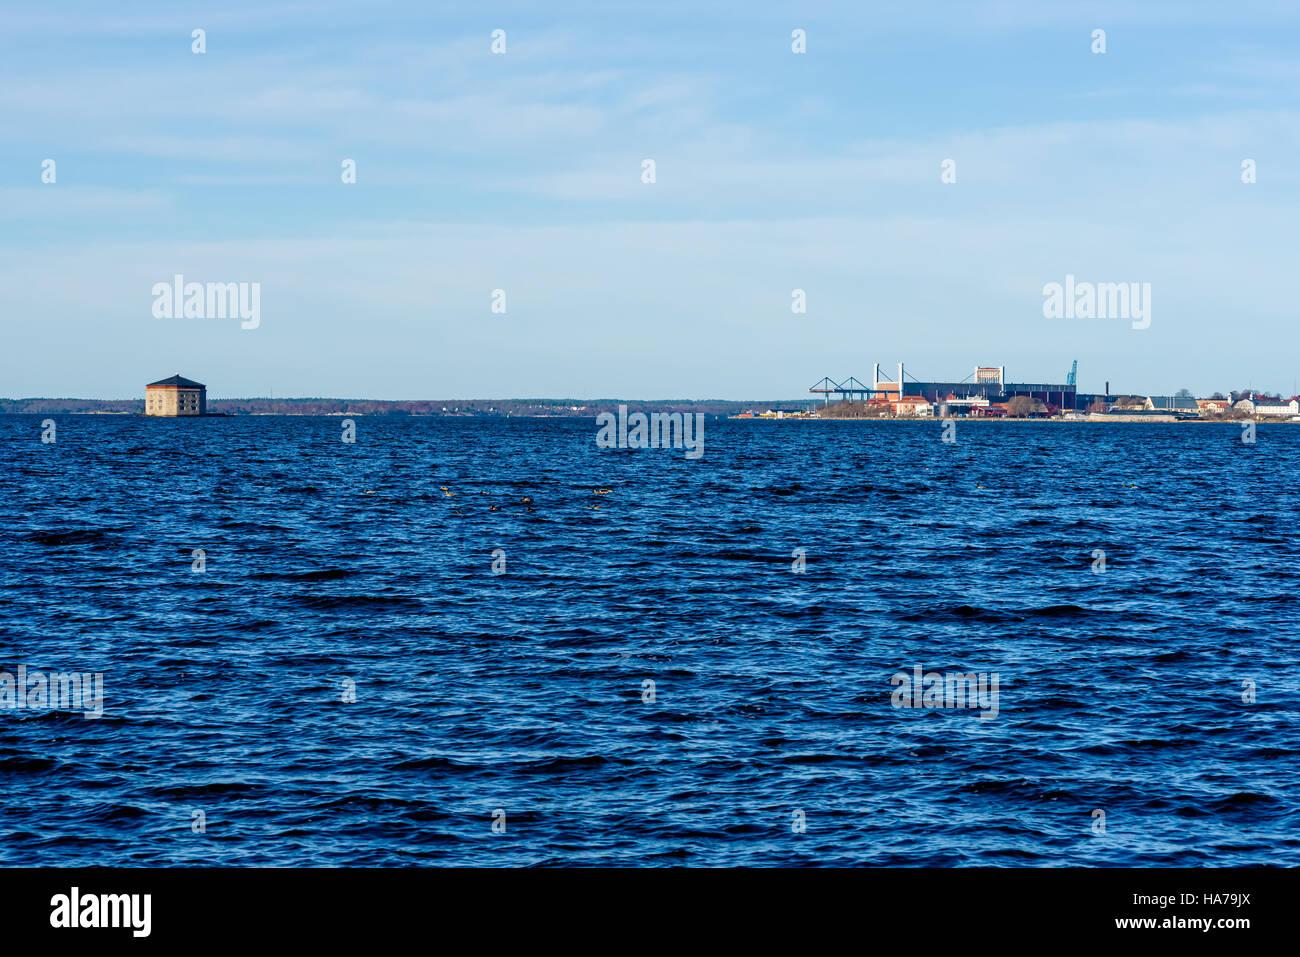 Part Of The Swedish Coastal Heritage City Karlskrona With Shipyard And 19th Century